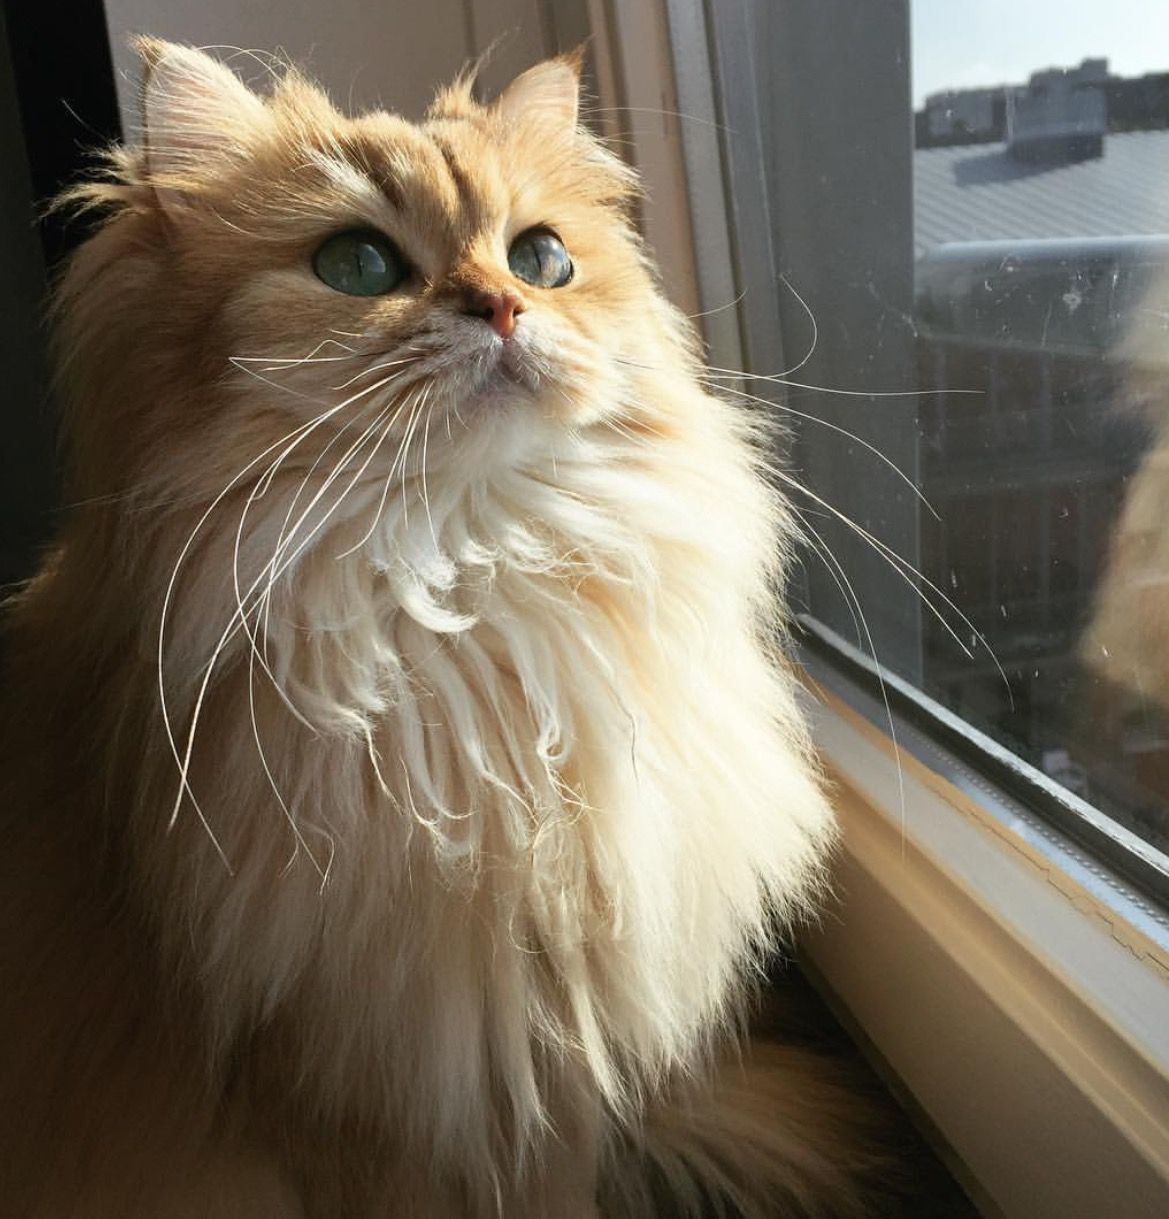 ᵛᴬᴿᵀᴬᴾ Pretty cats, Cute cats, Fluffy cat